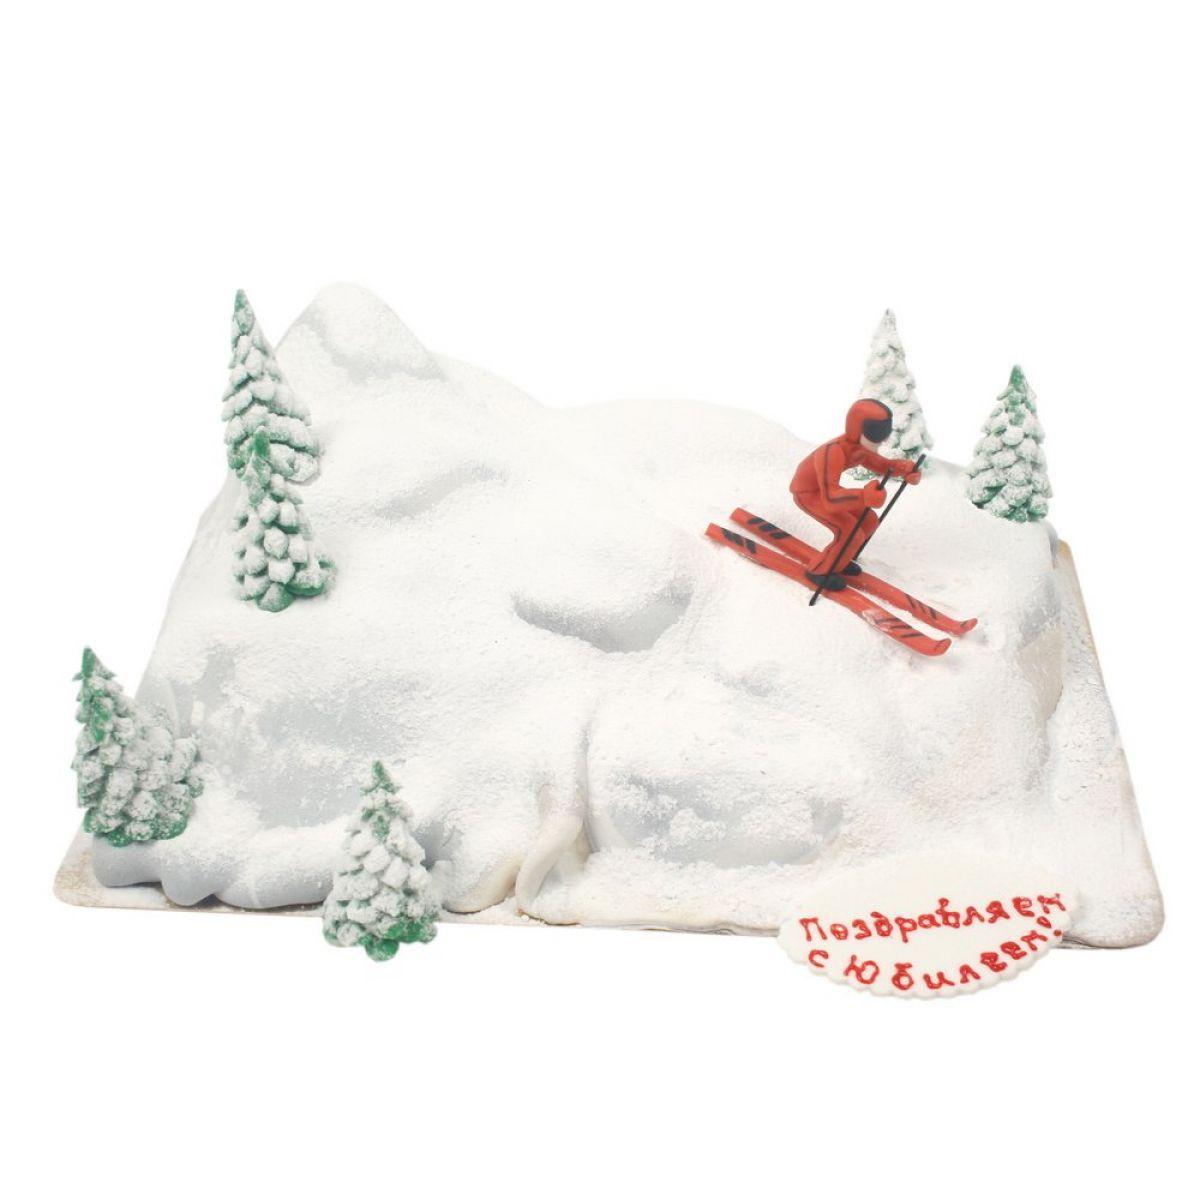 №801 Торт сноуборд